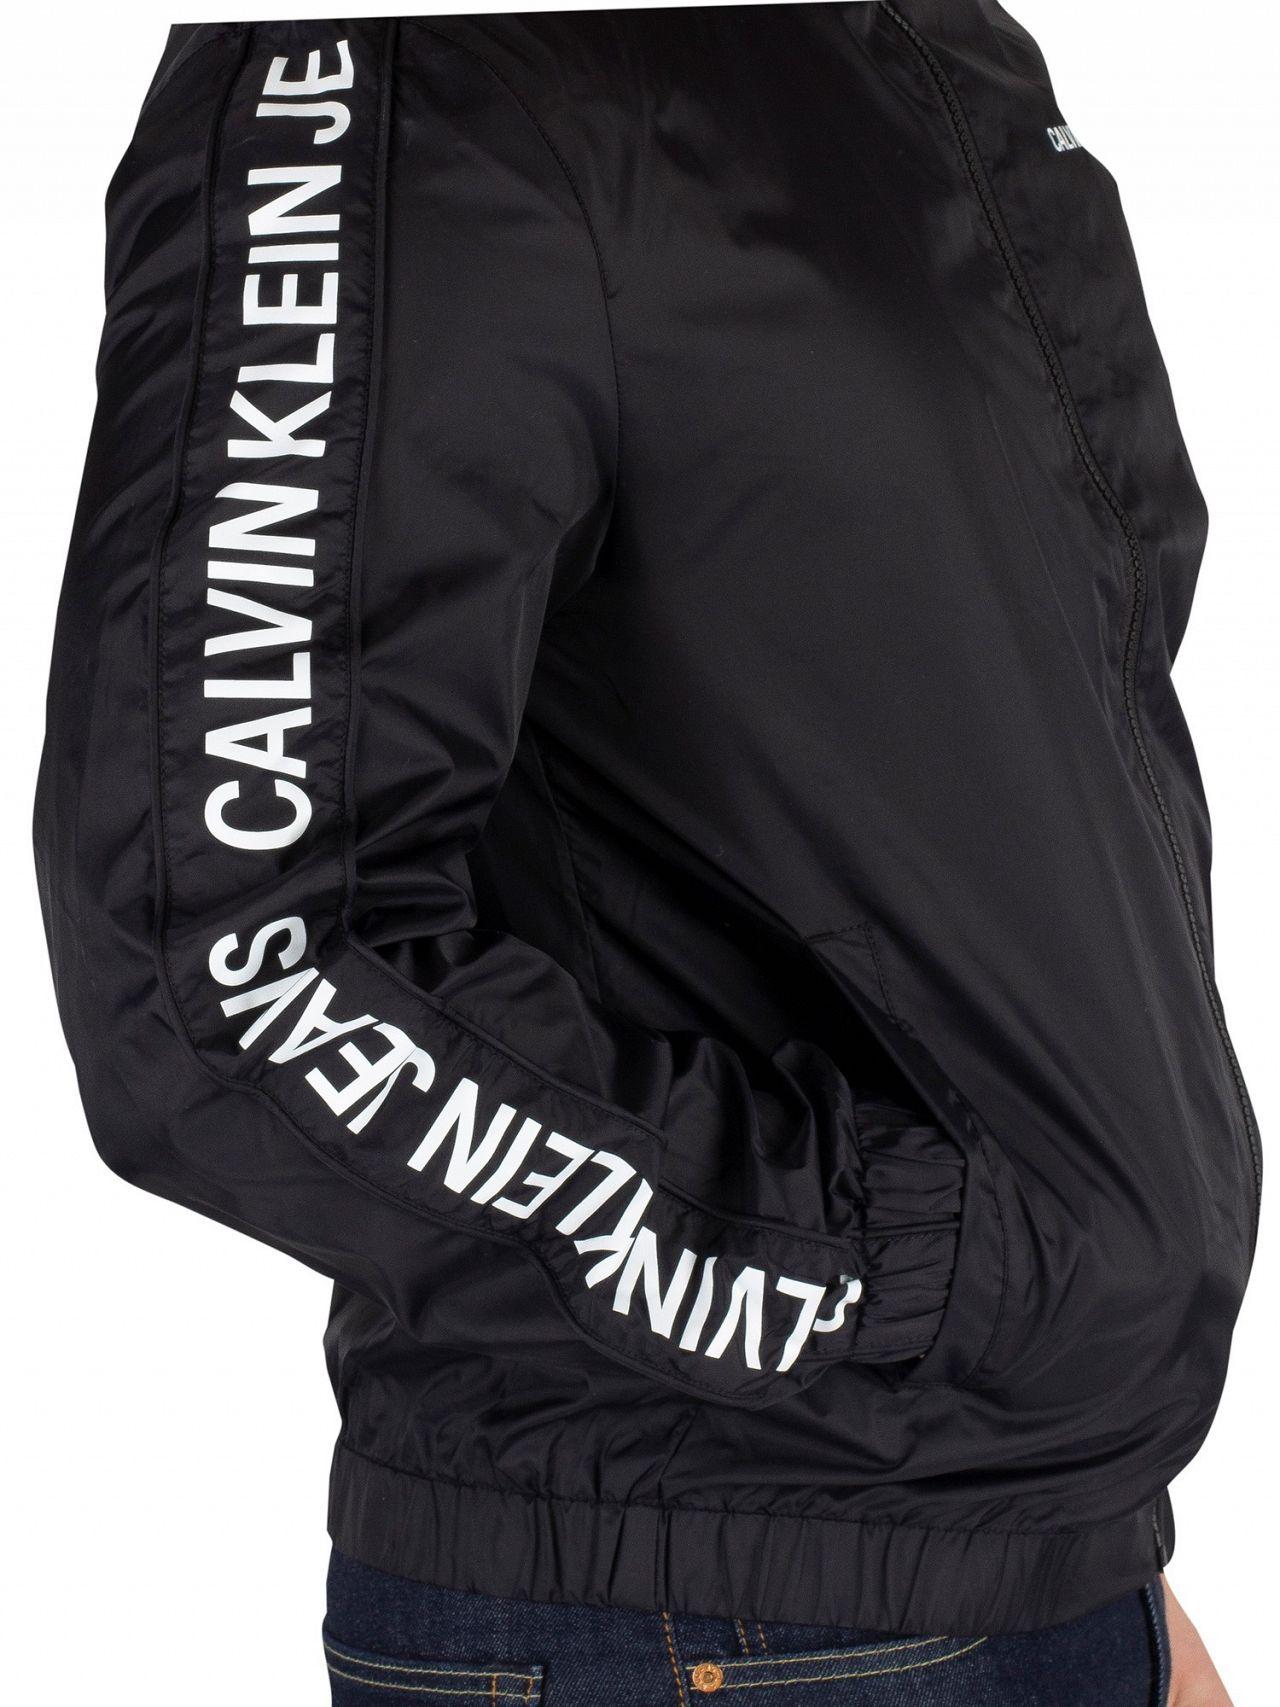 2163880ea00e Calvin Klein Jeans Black Side logo Truck Jacket | Standout